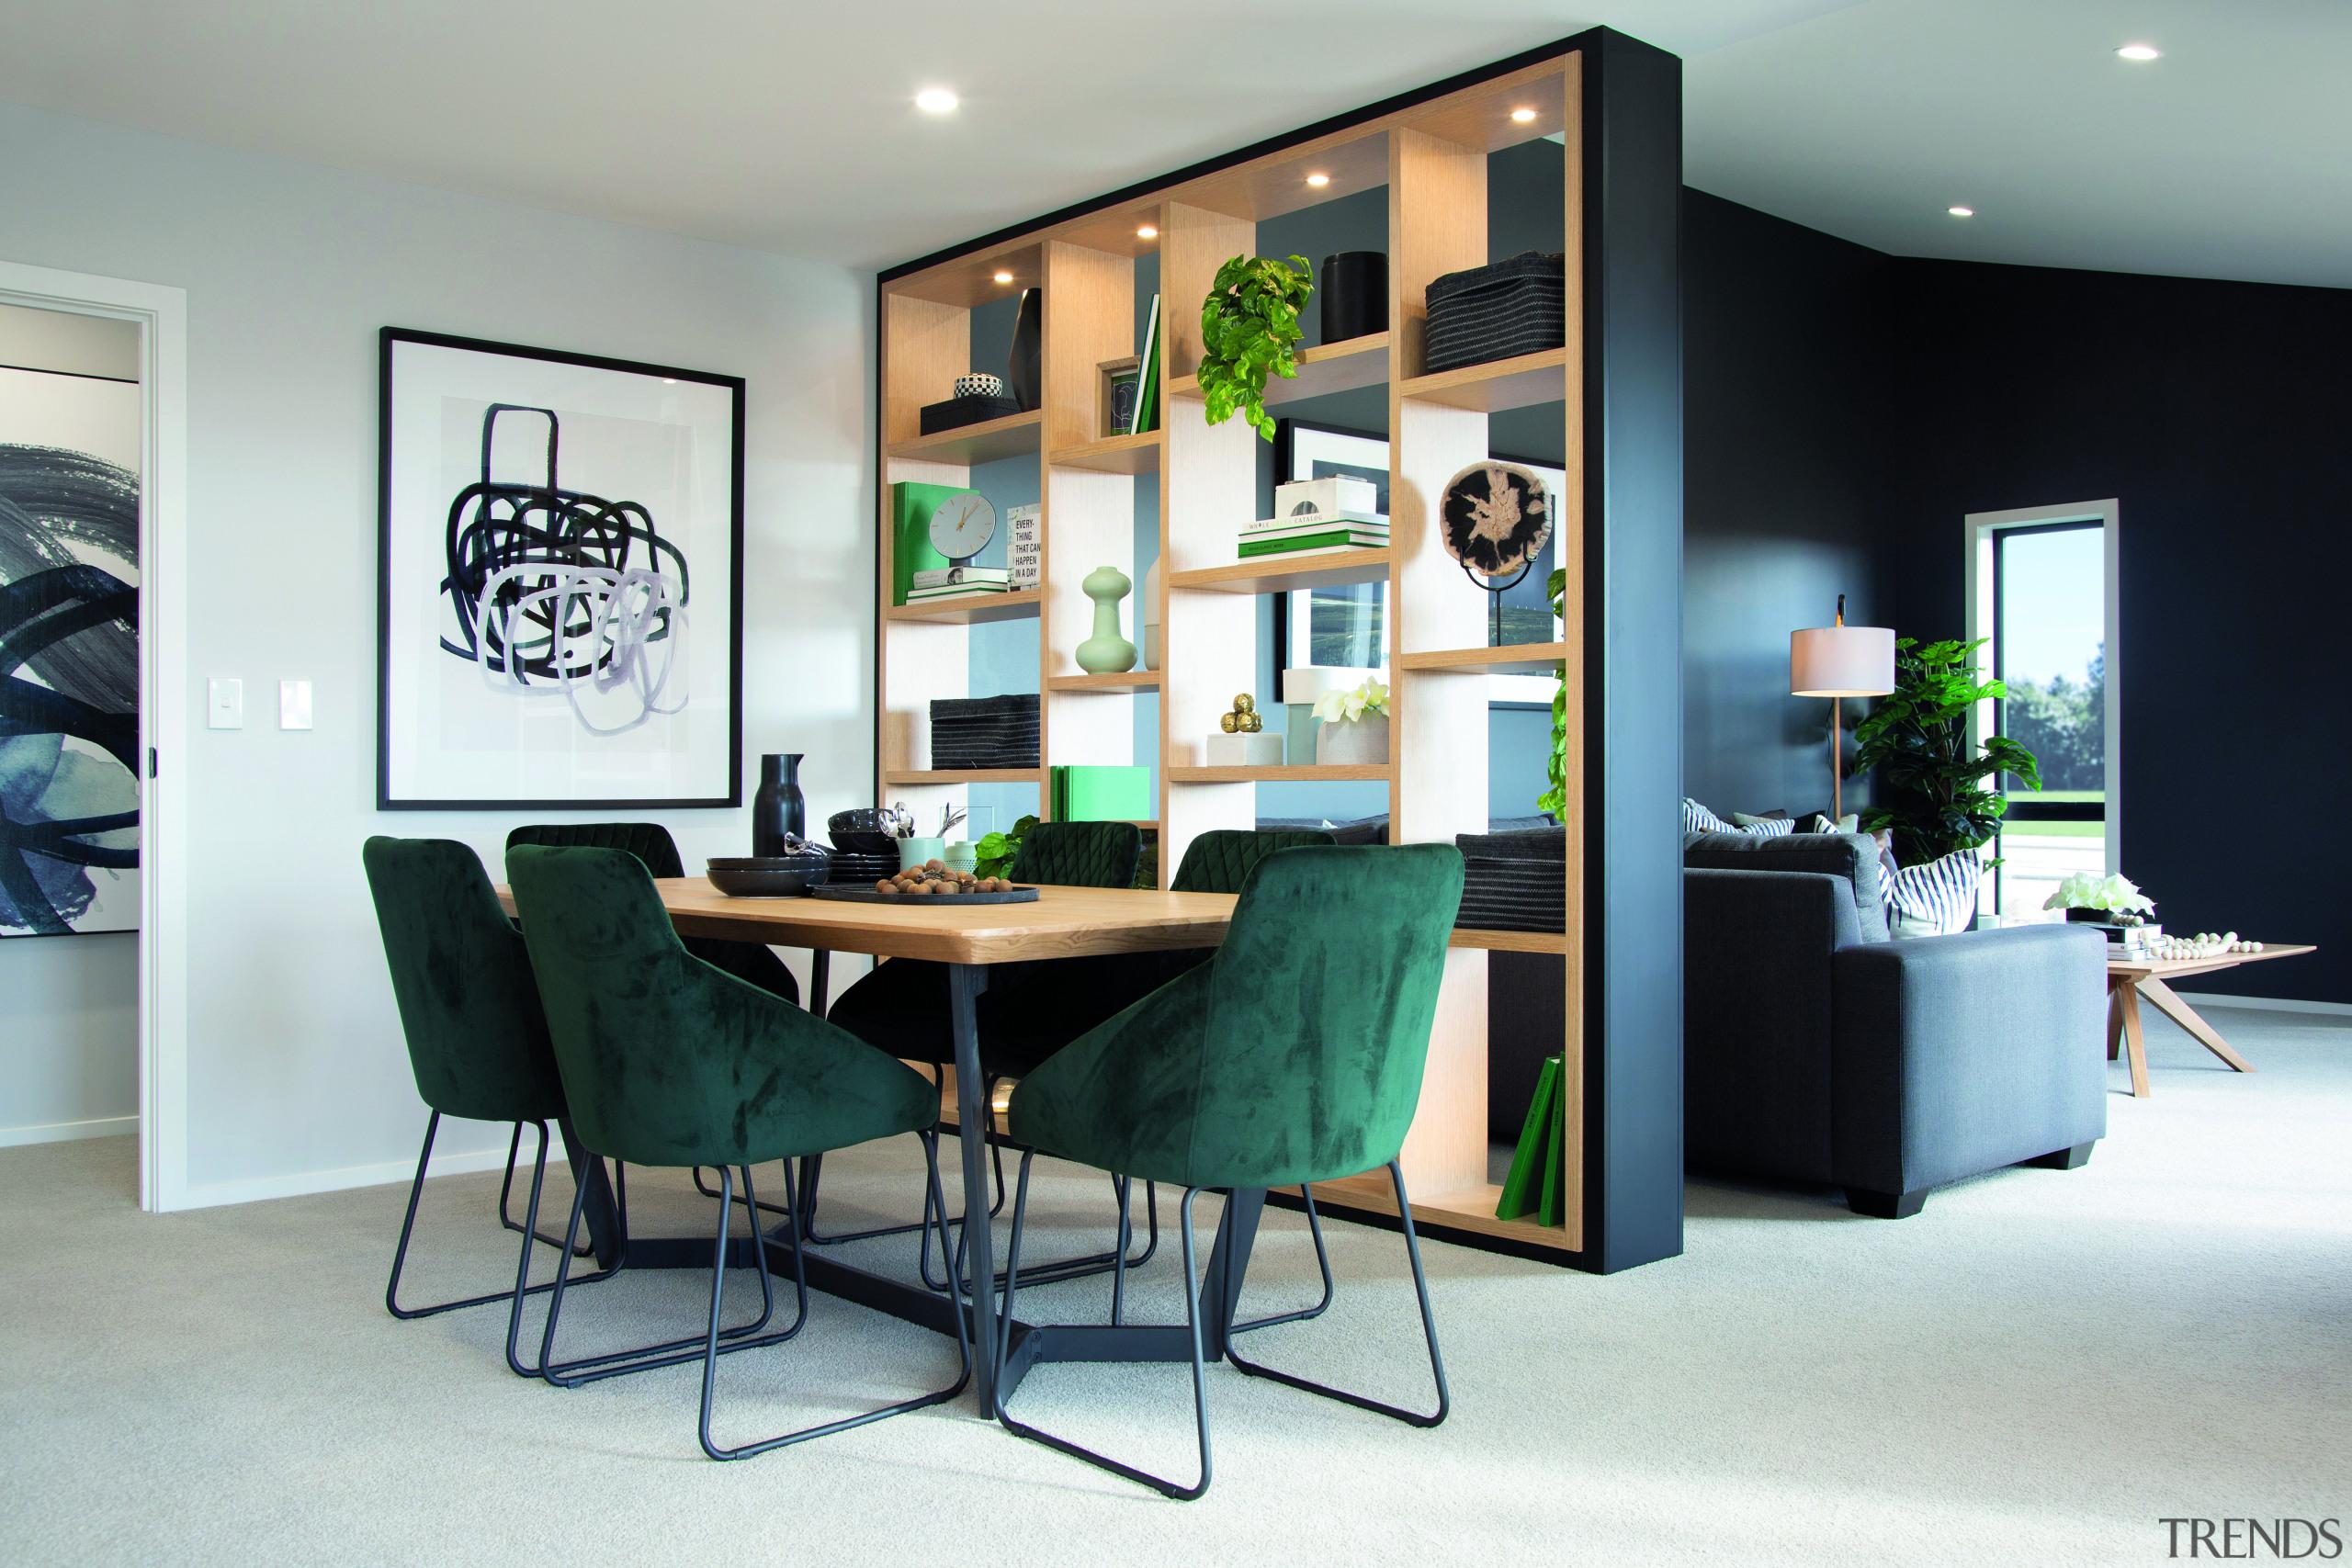 In this new Rotokauri Rise showhome by GJ design, dining room, floor, flooring, furniture, green, home, house, interior design, living room, dining , table, Resene, GJ Gardner